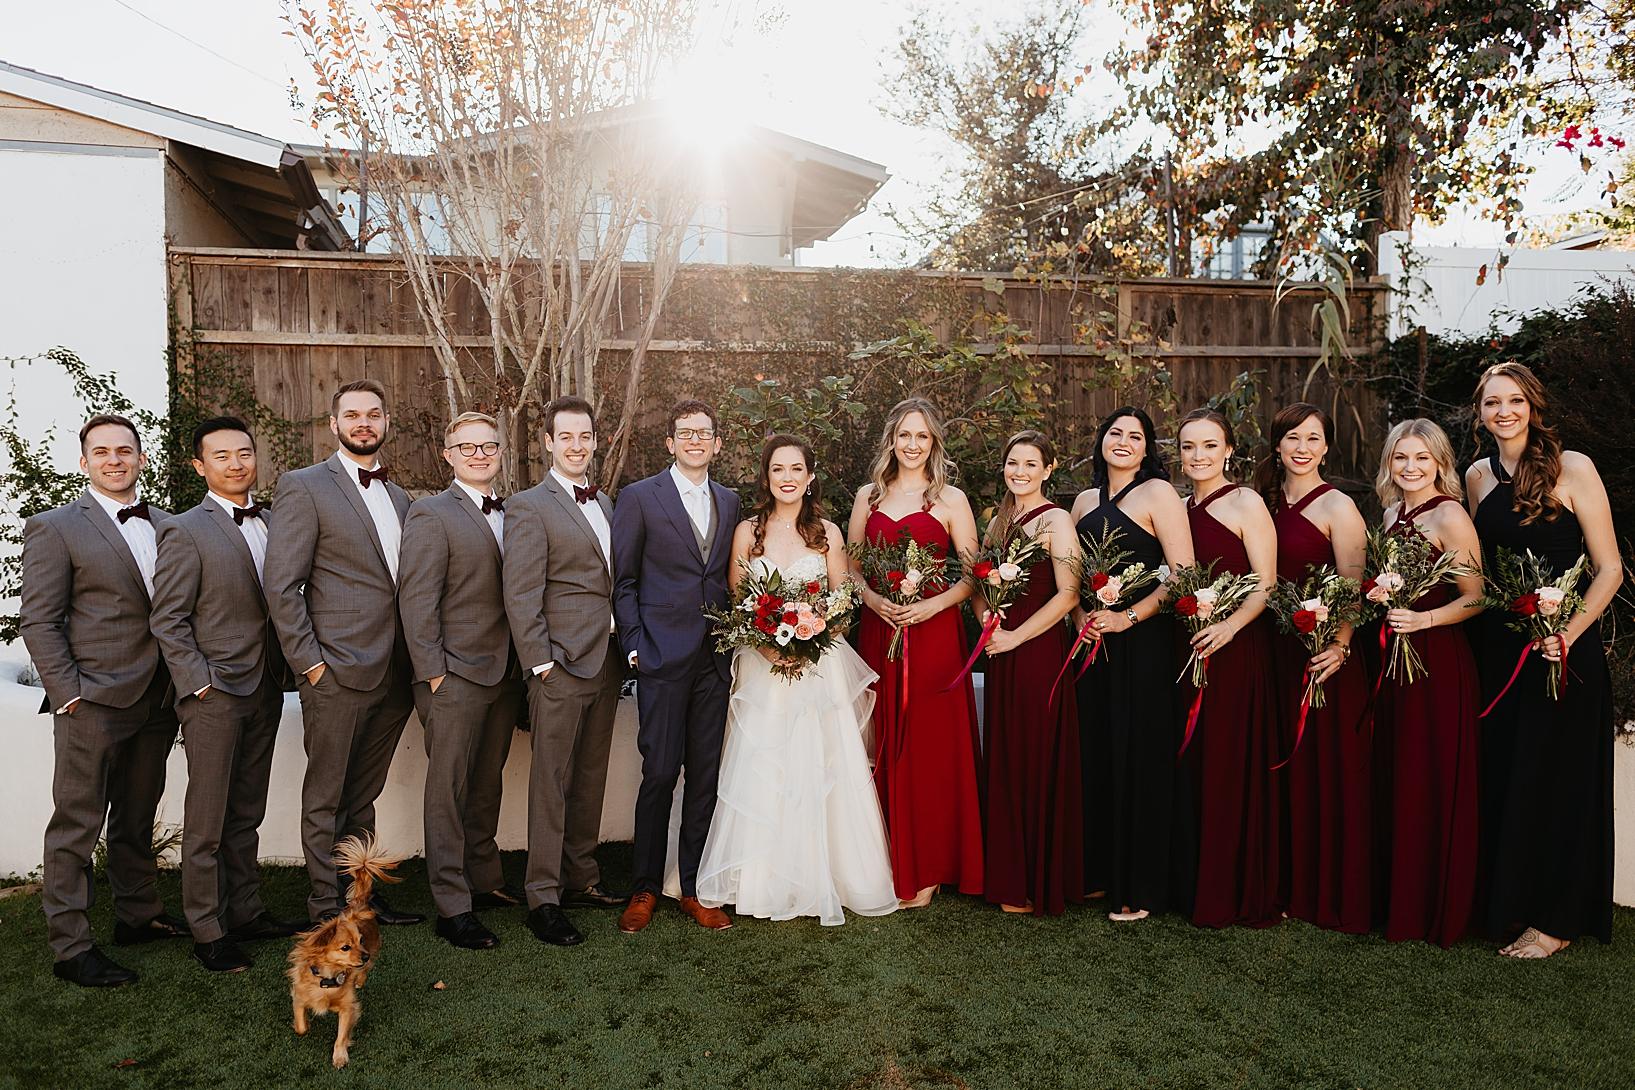 Brick-San-Diego-Winter-Wedding-21.jpg